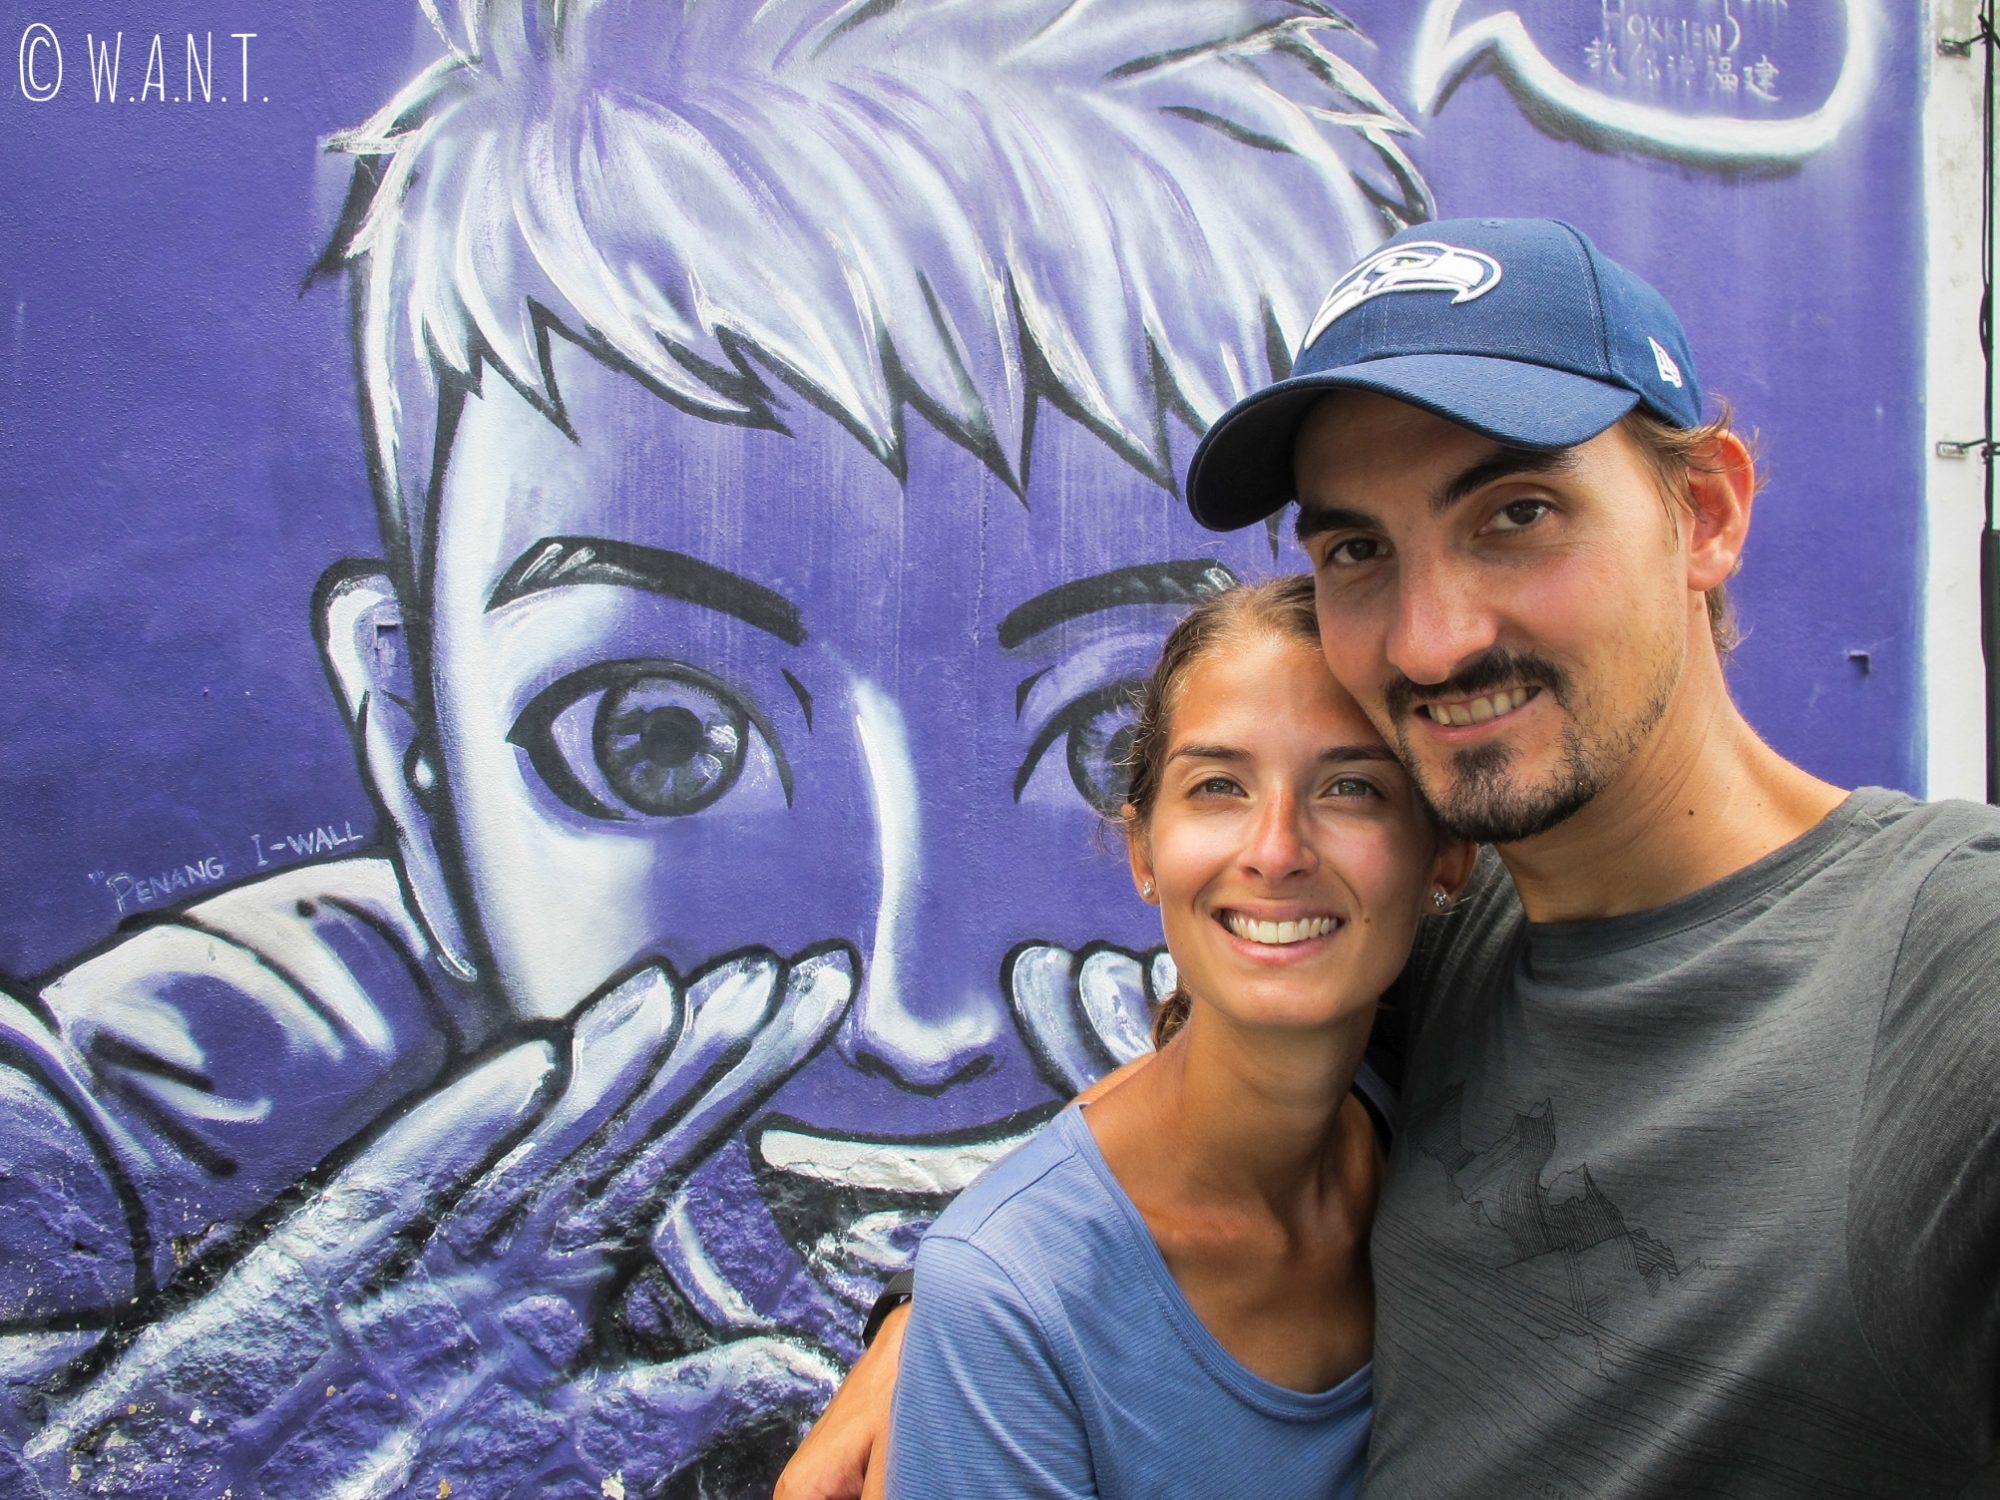 Selfie devant Teach You Hokkien Mural, art de rue dans Georgetown à Penang